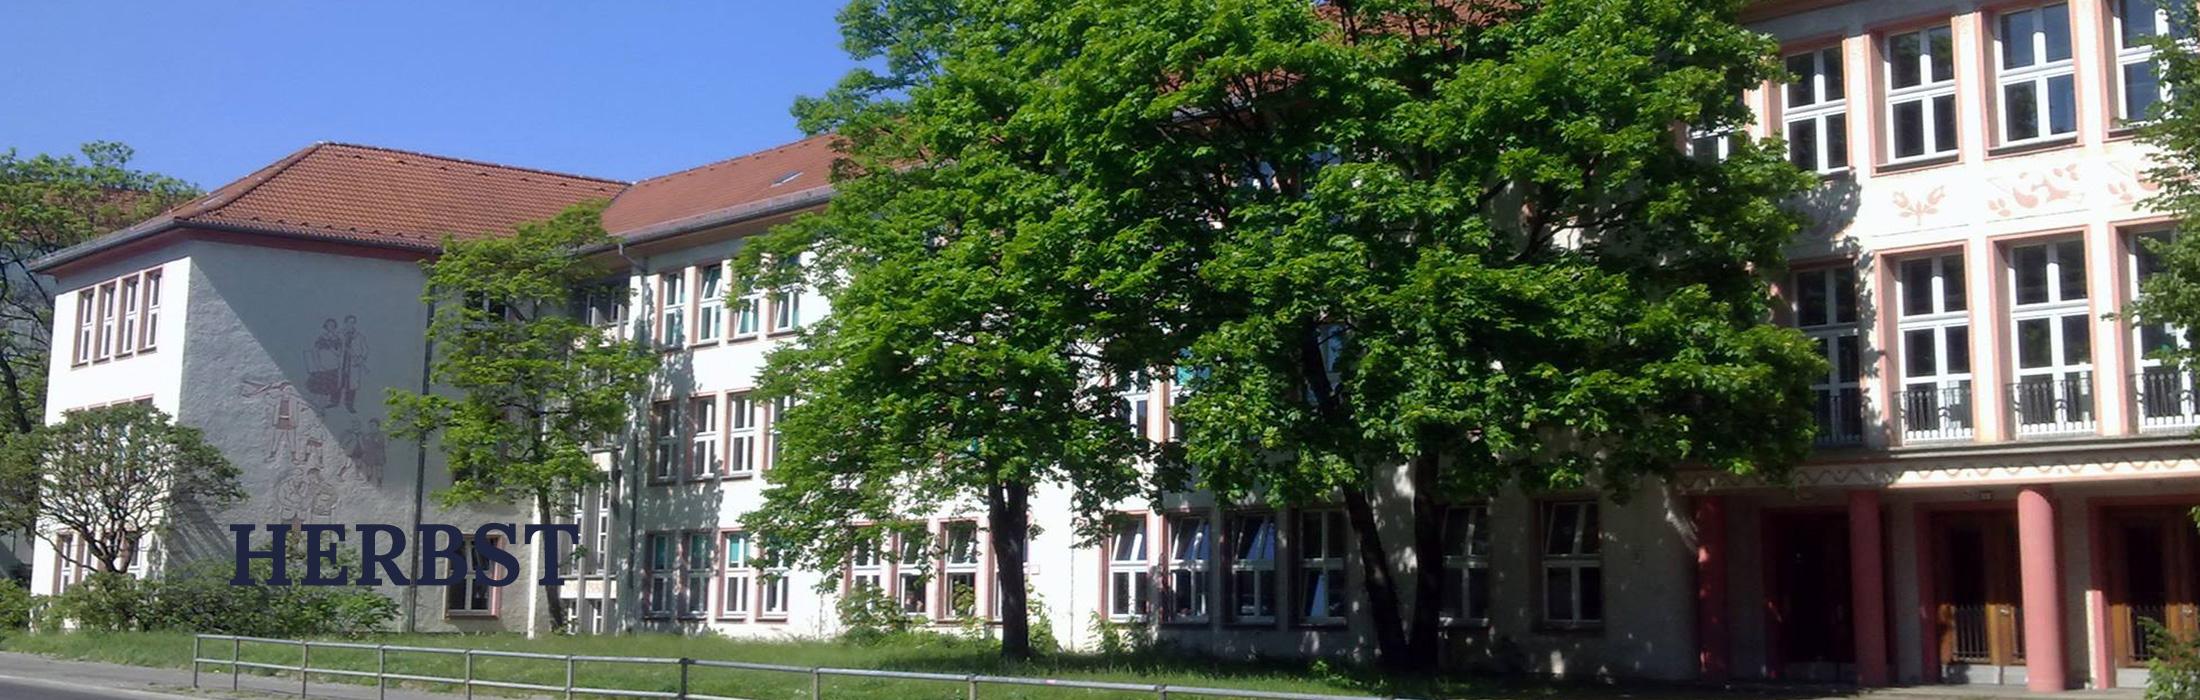 ardenne-schule-autumn